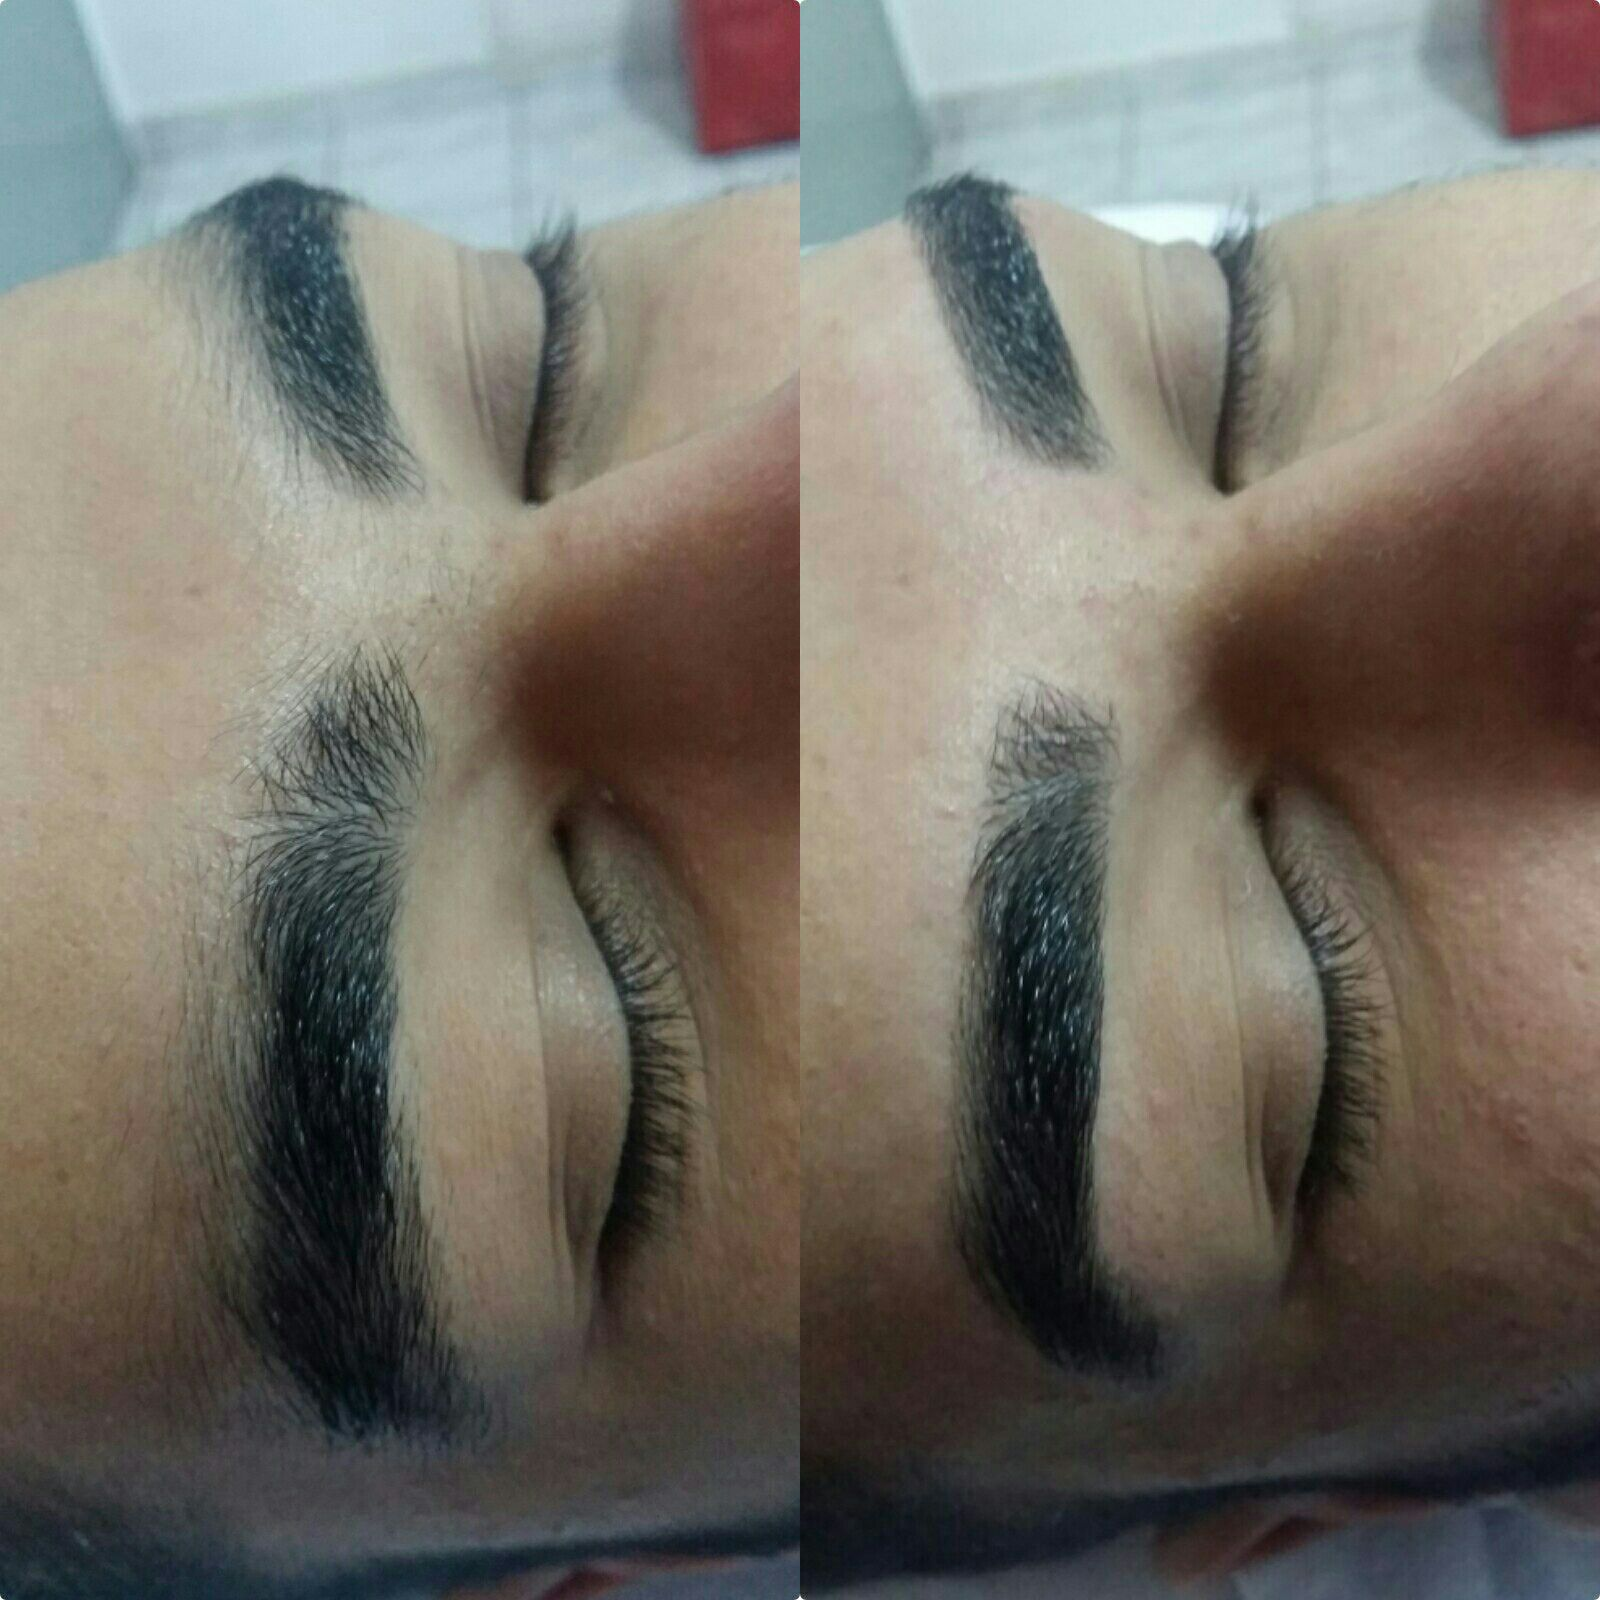 Design masculino outros esteticista auxiliar cabeleireiro(a) designer de sobrancelhas assistente esteticista assistente esteticista